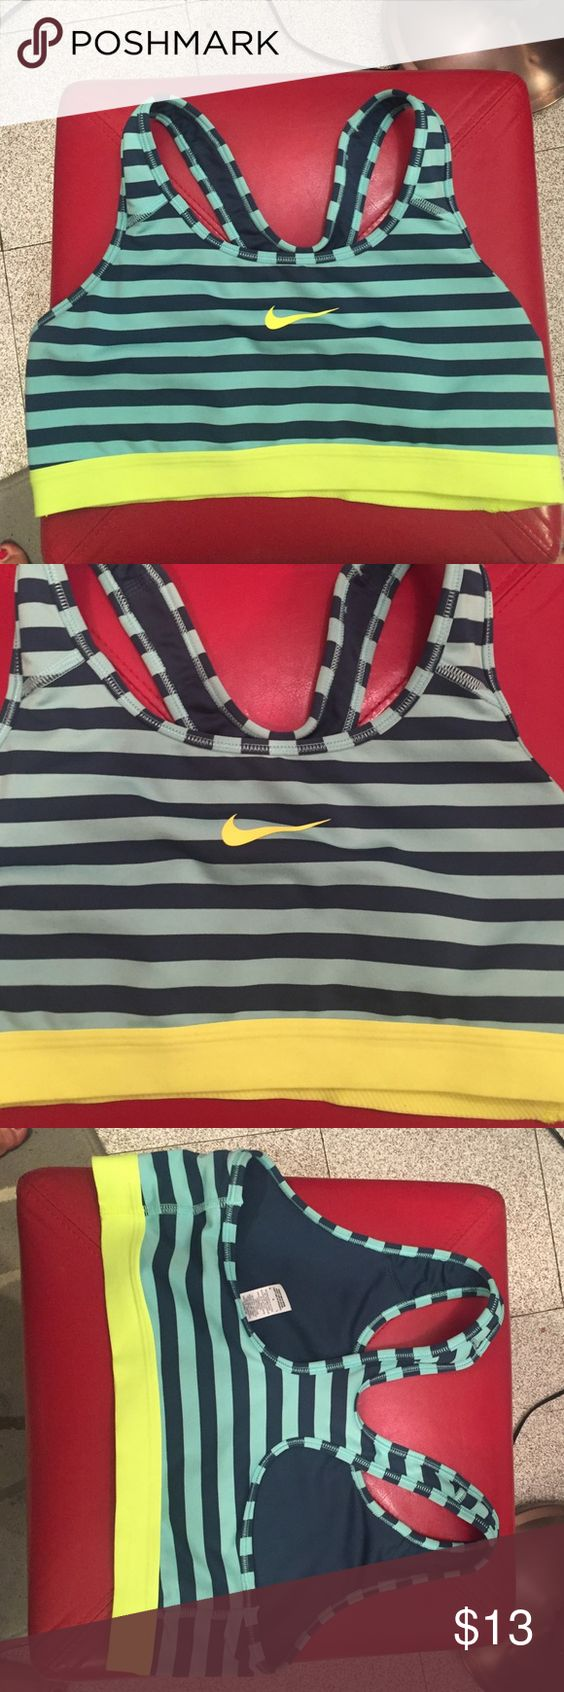 Nike sports bra Nike striped sports bra, worn a few times, size large Nike Intimates & Sleepwear Bras